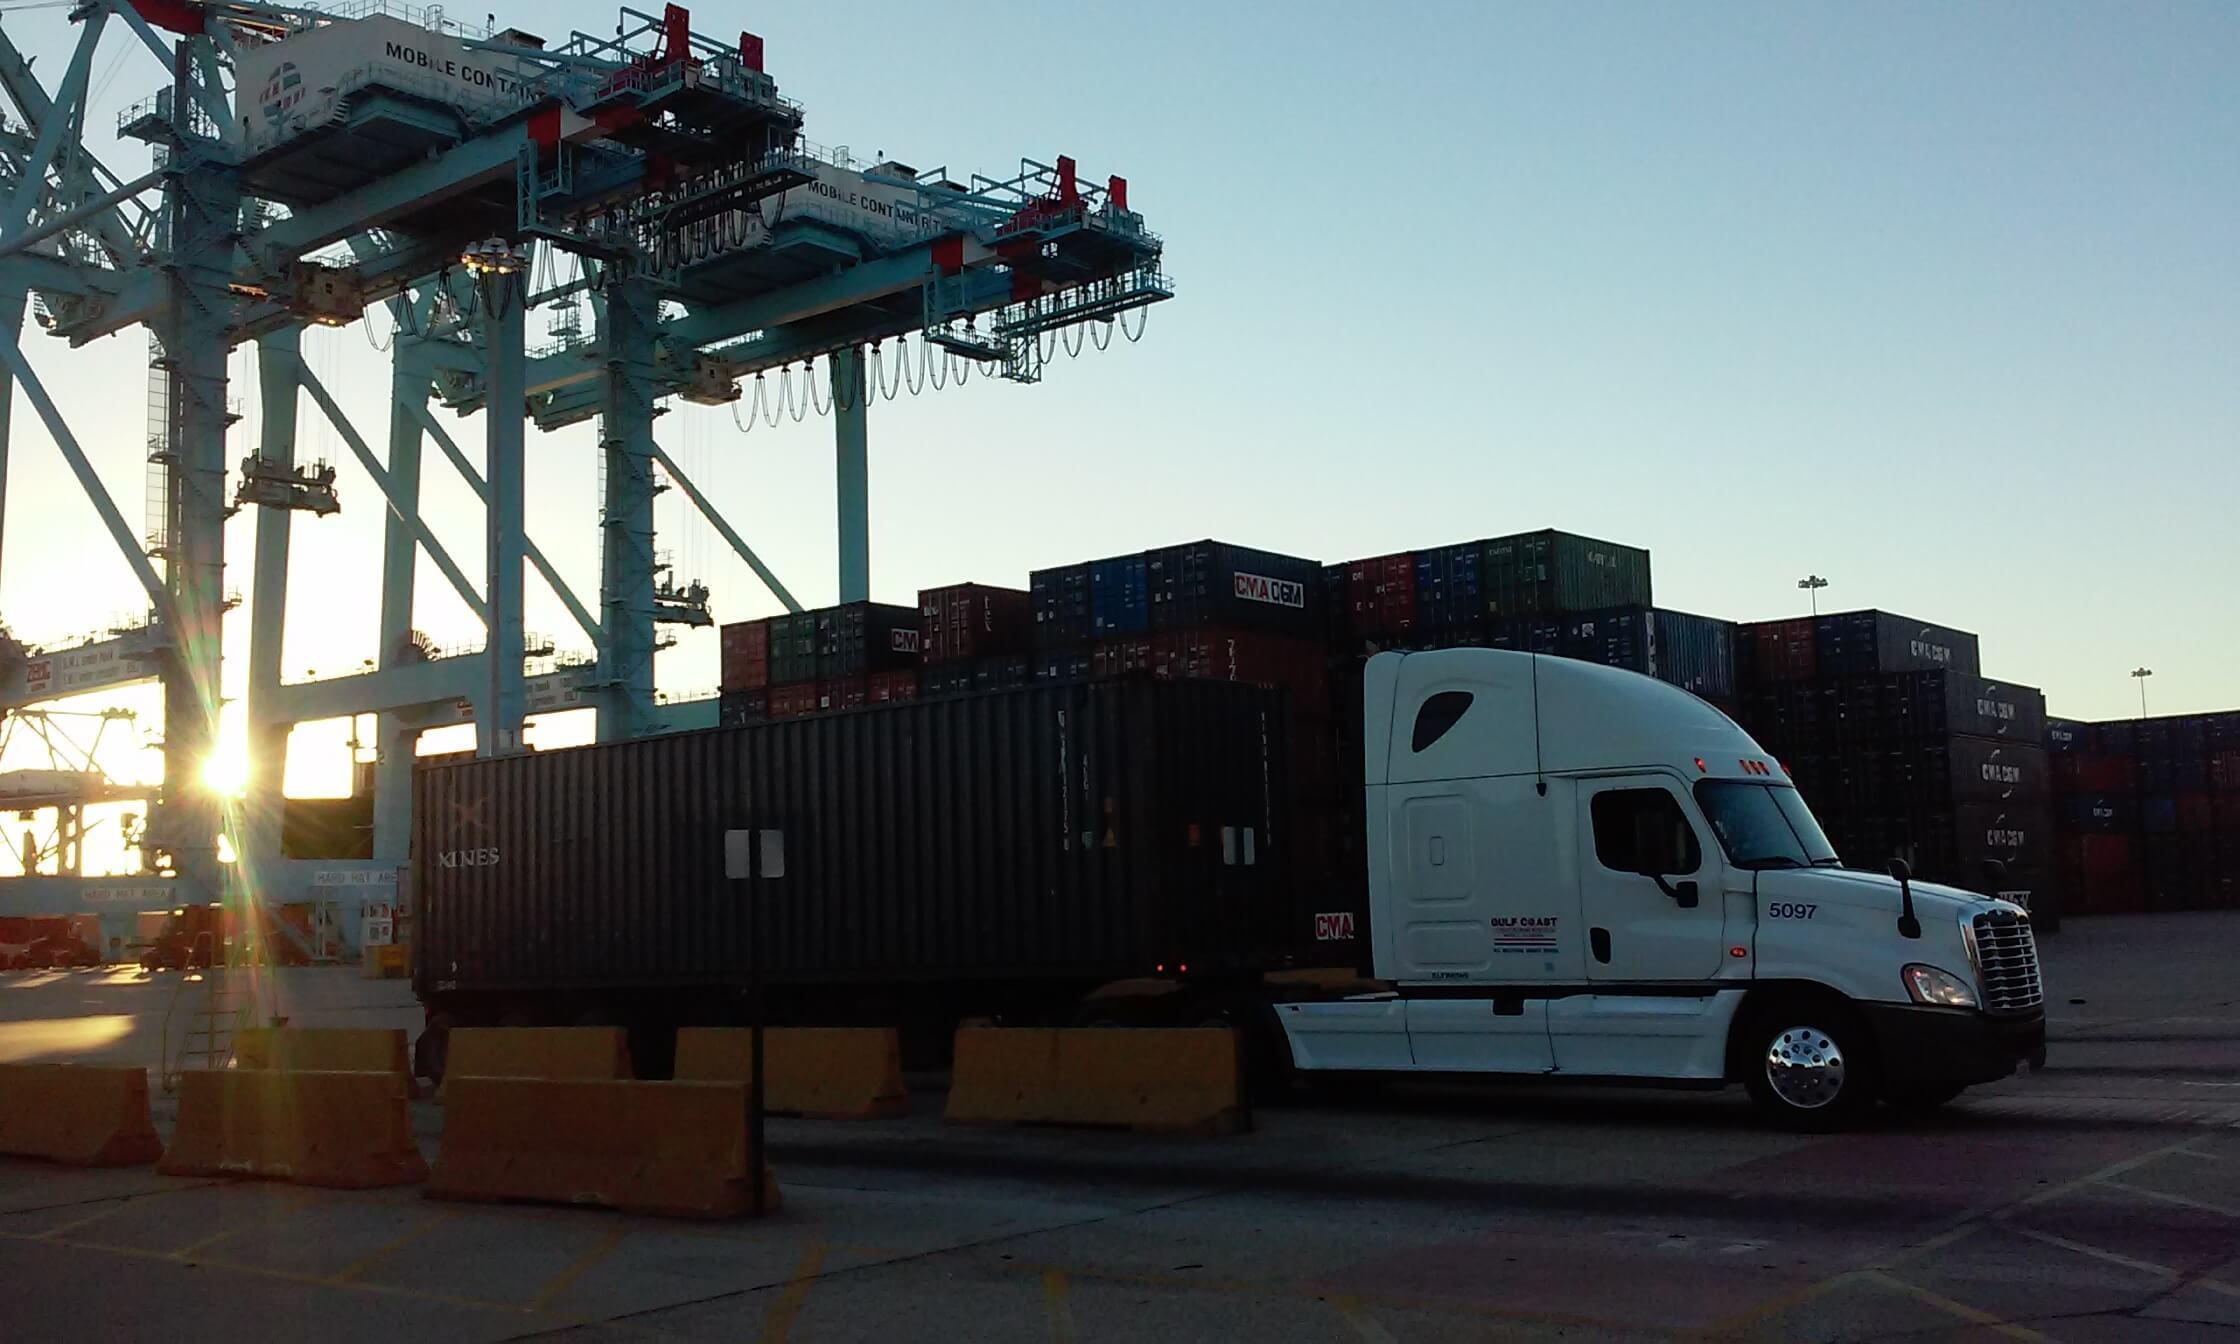 Gulf Coast Intermodal Truck Loading at the Dock